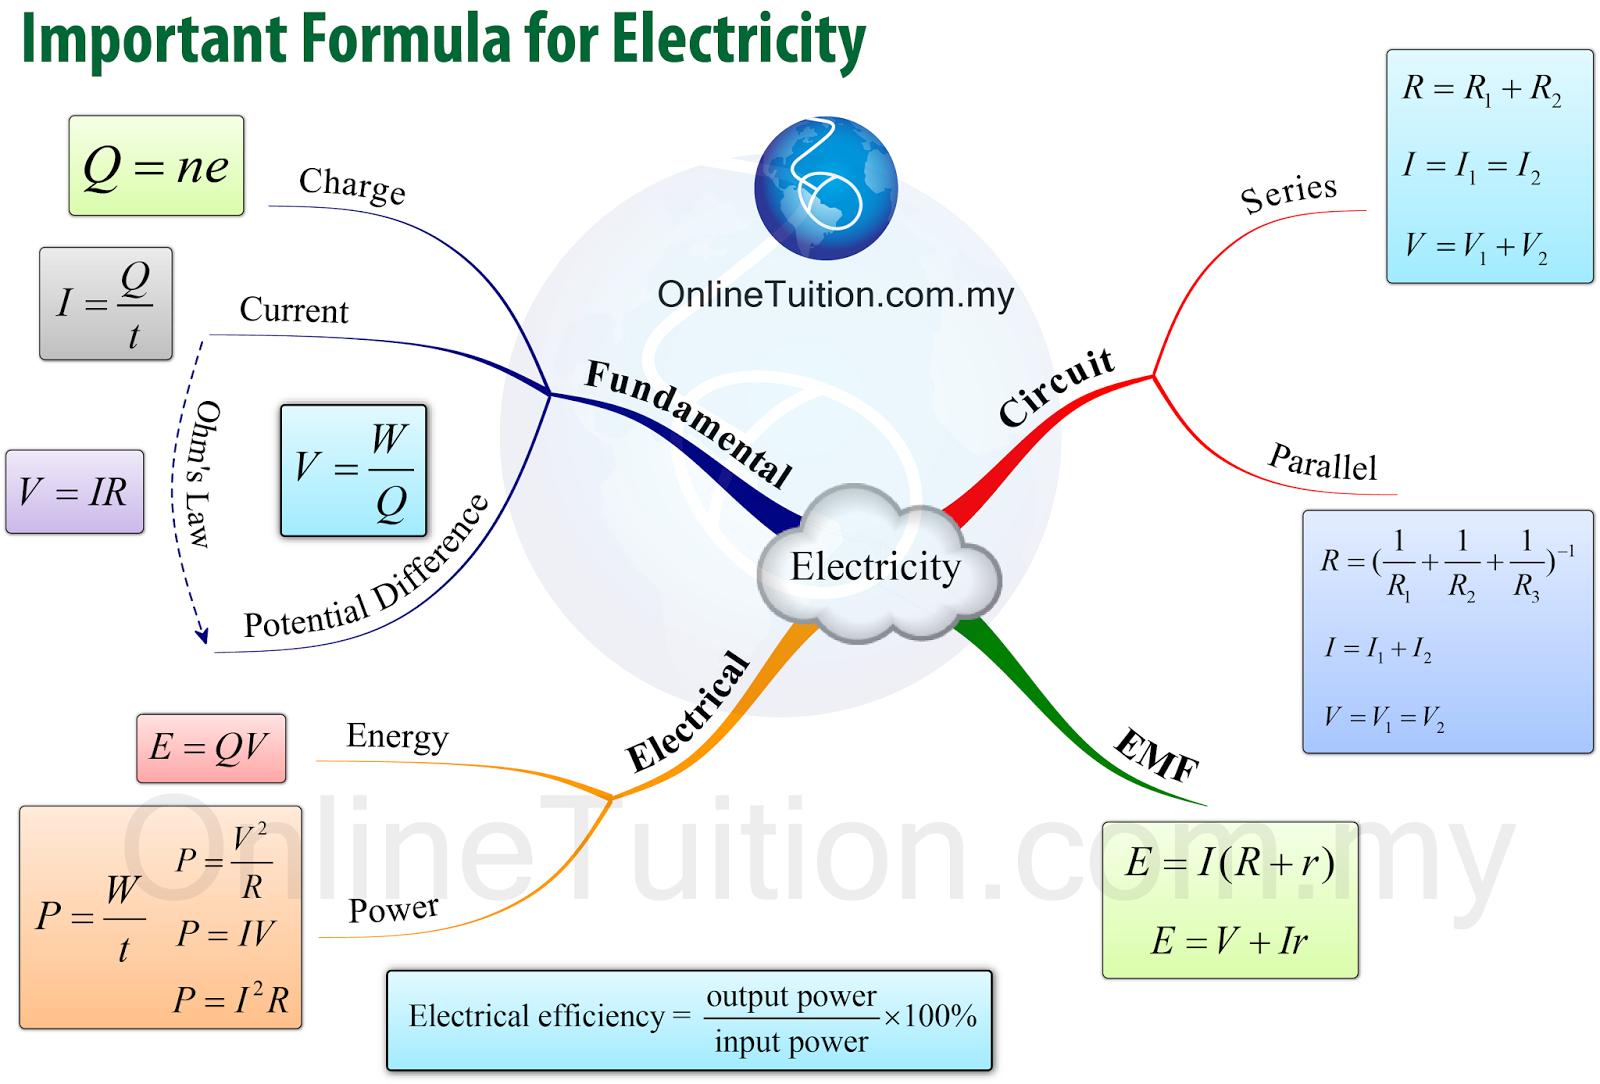 electricity physics - Поиск в Google | Physics | Pinterest ...